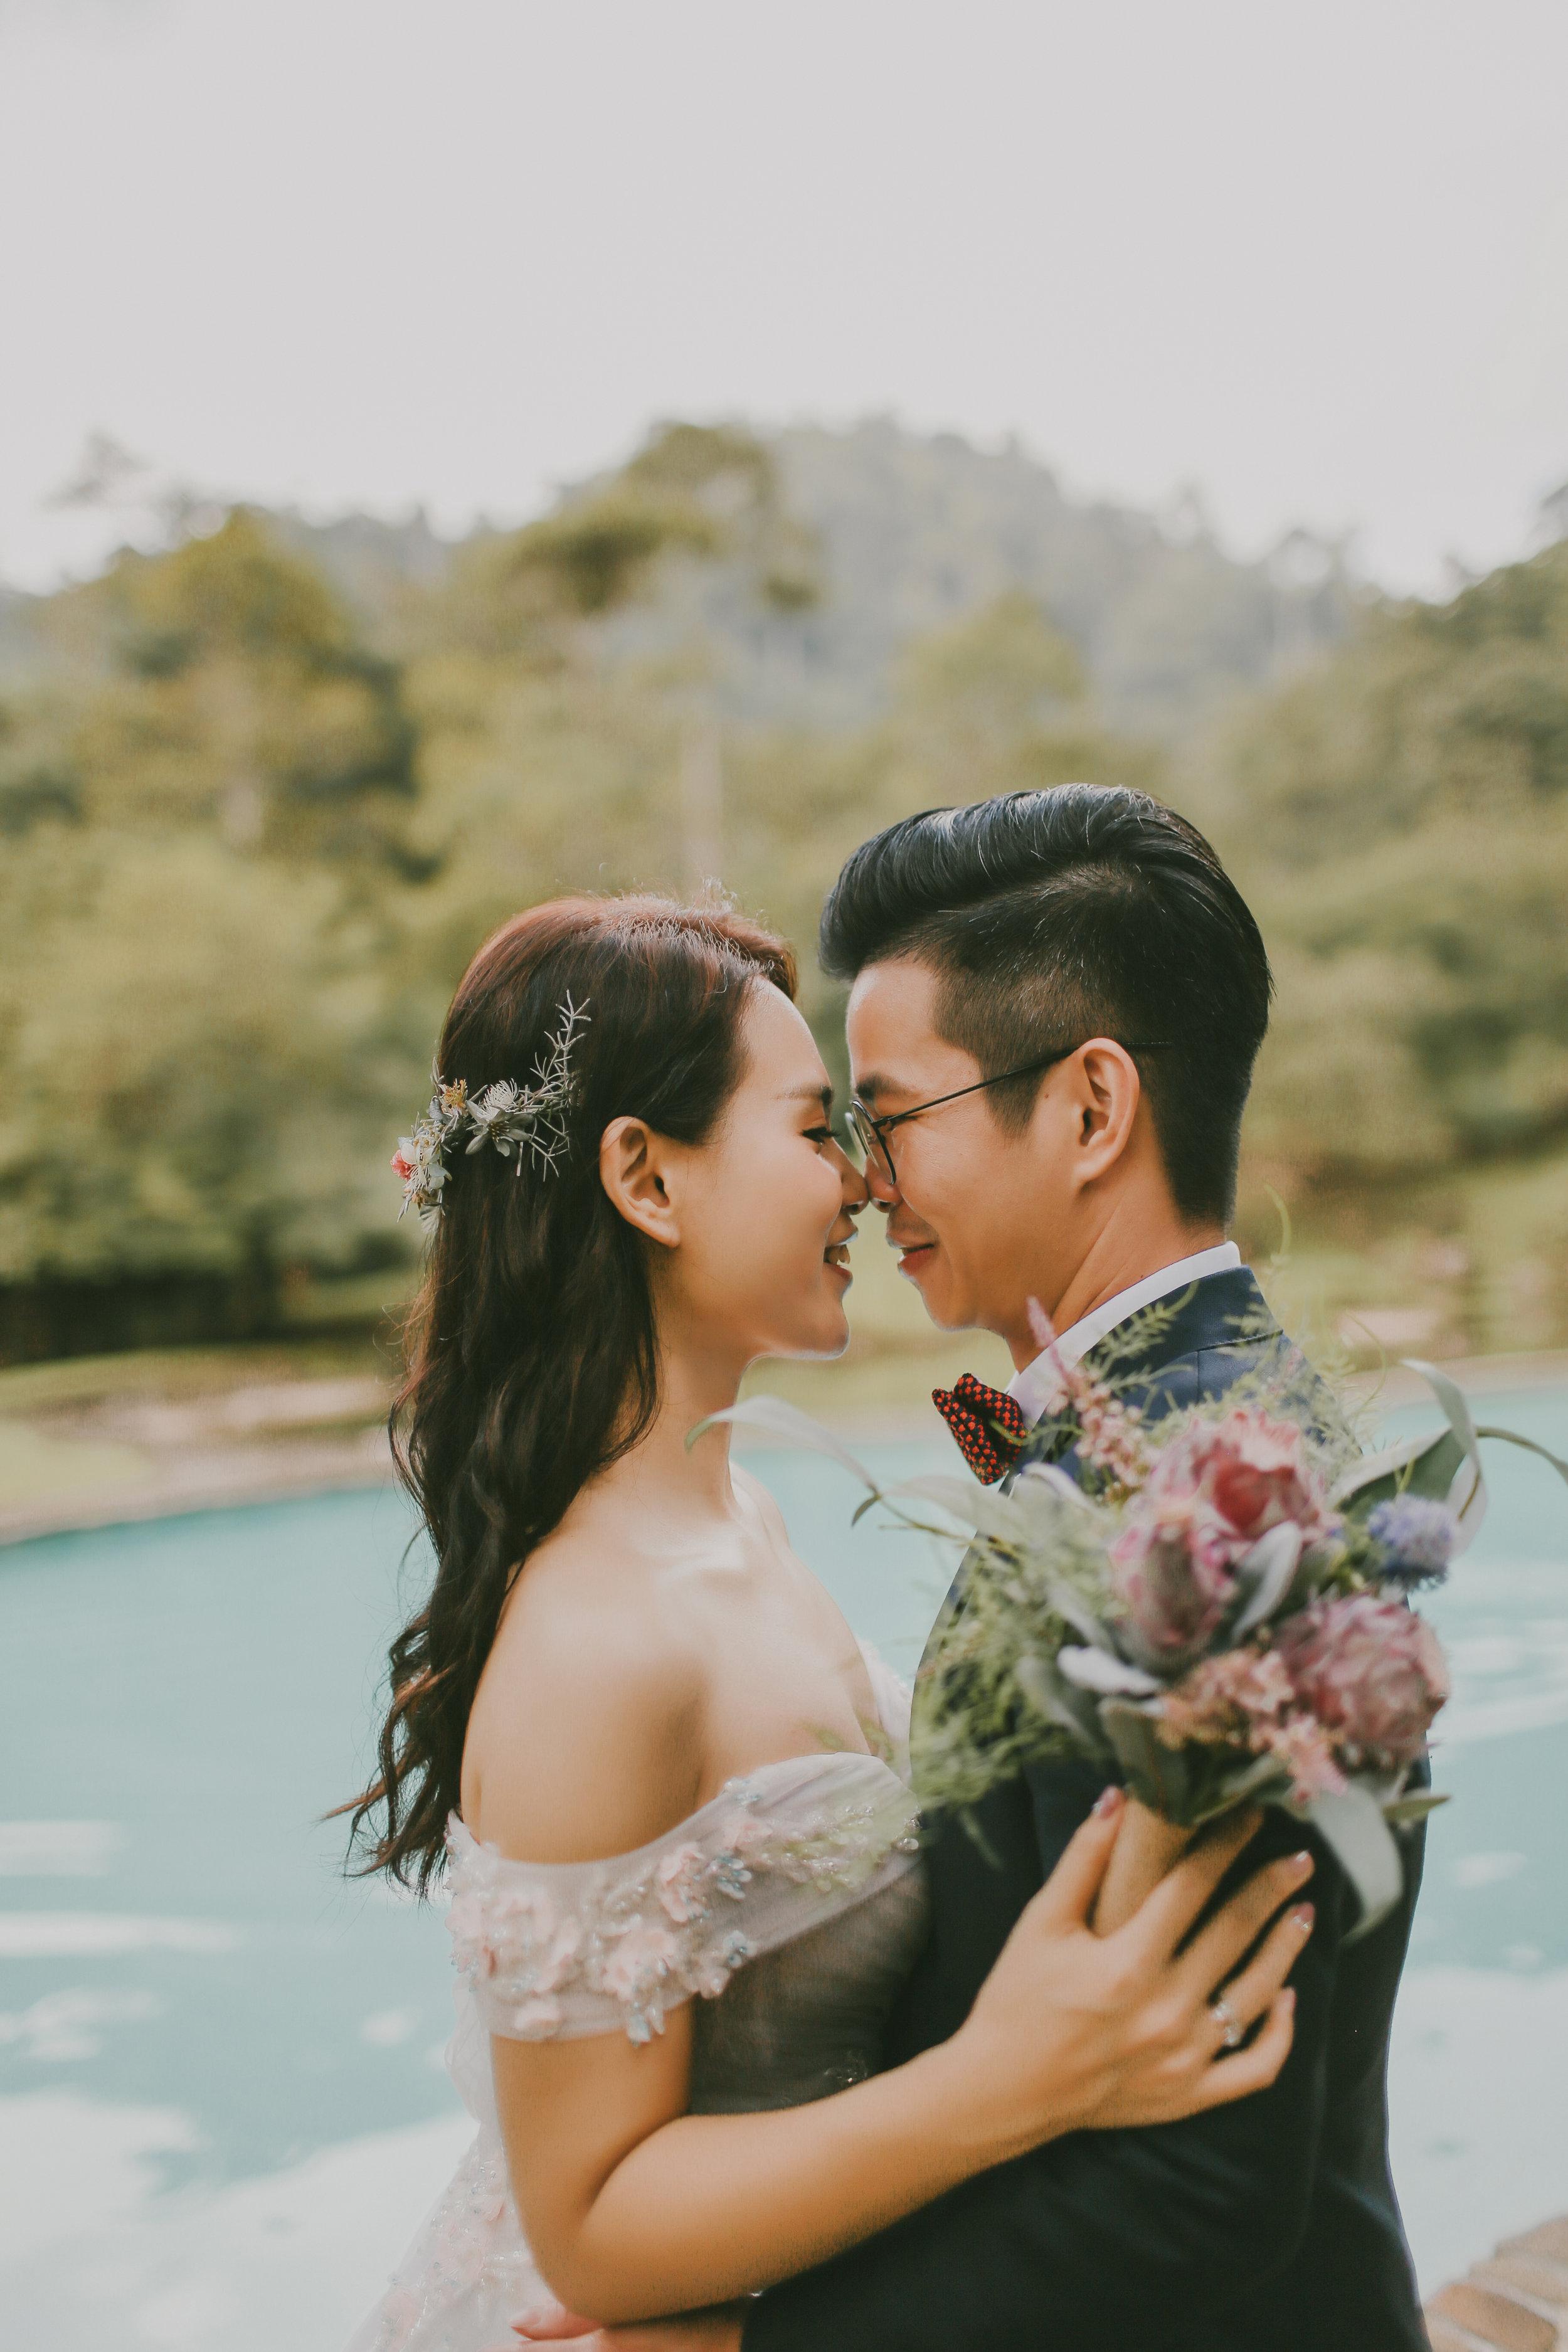 2019-pre-wedding-studio-numb9r-janda-baik-bentong-malaysia-8692e.jpg